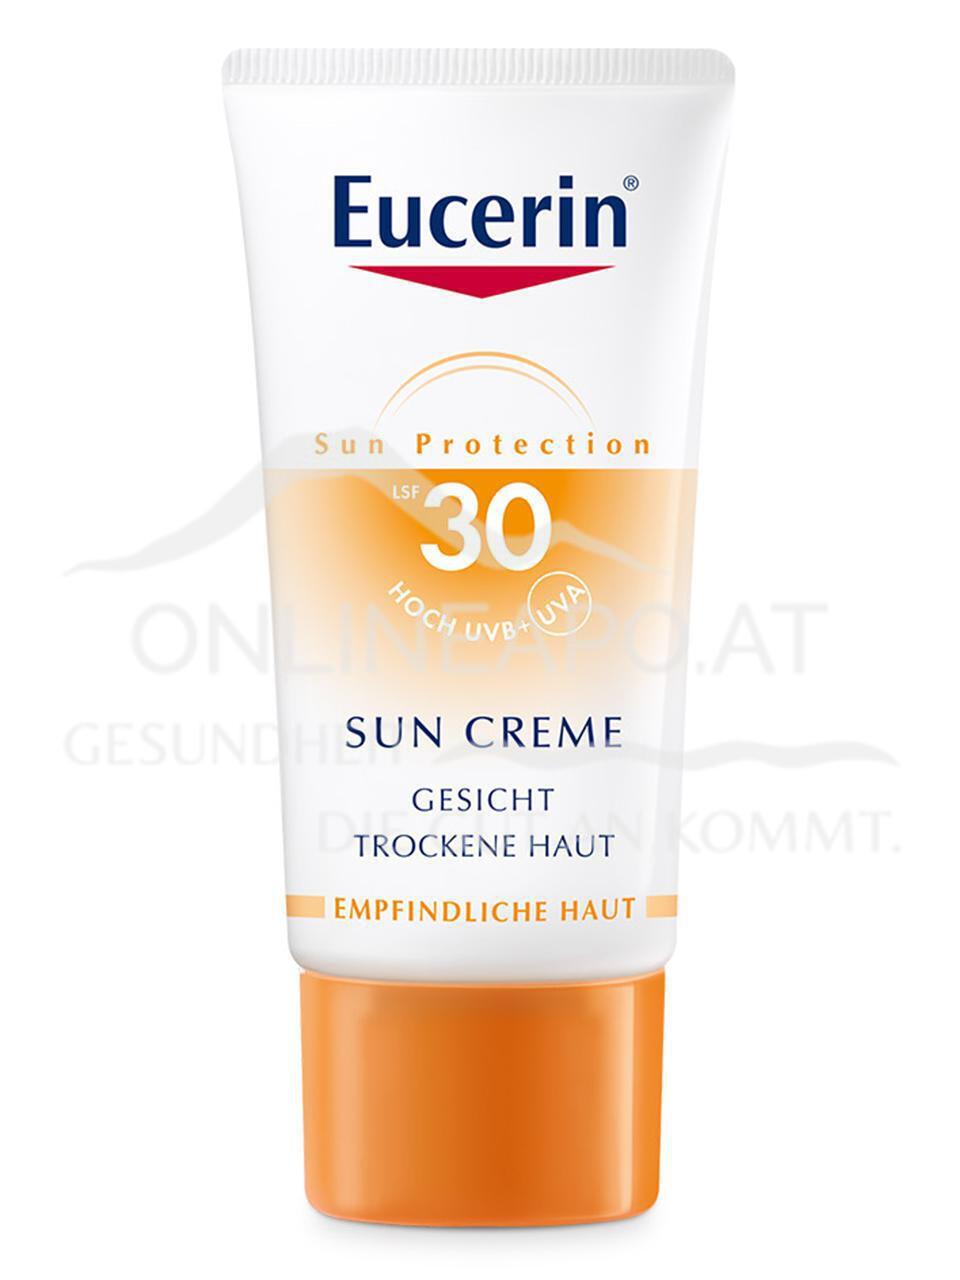 Eucerin SUN CREME LSF 30 für normale bis trockene Haut